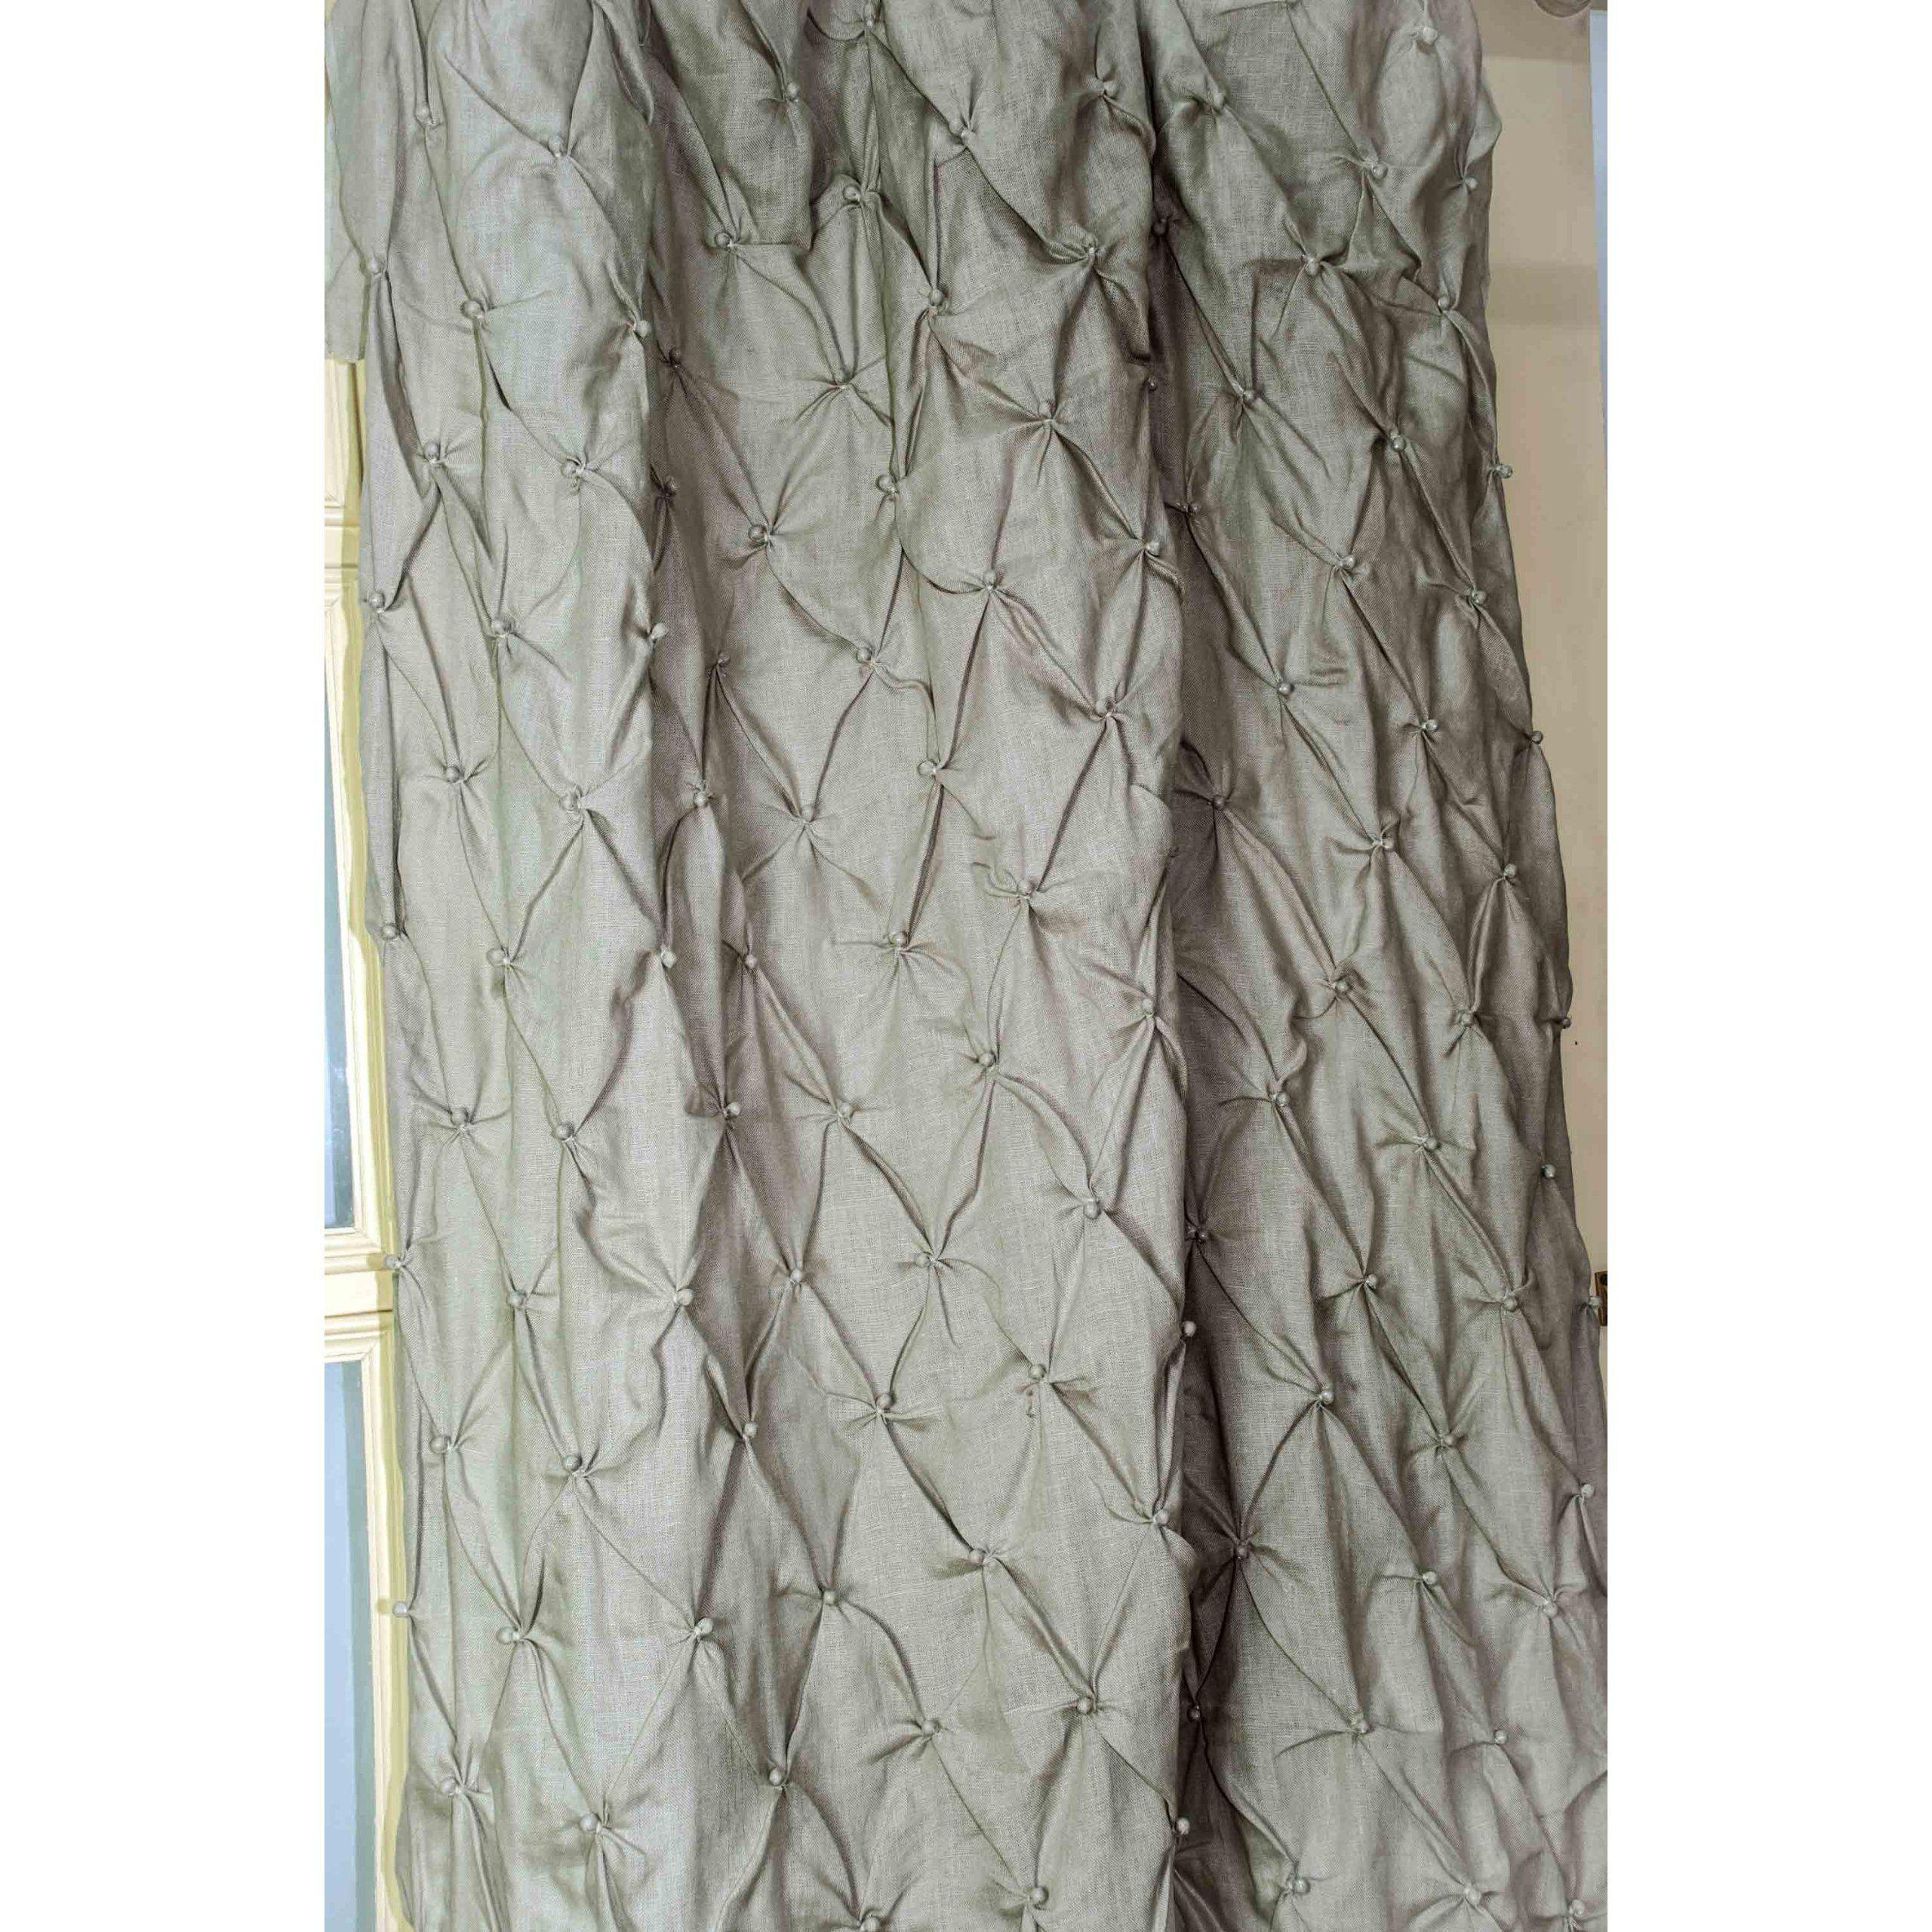 Linen Hand Knotted Curtain Panel Drape Item No D3 SAMZ XOMB